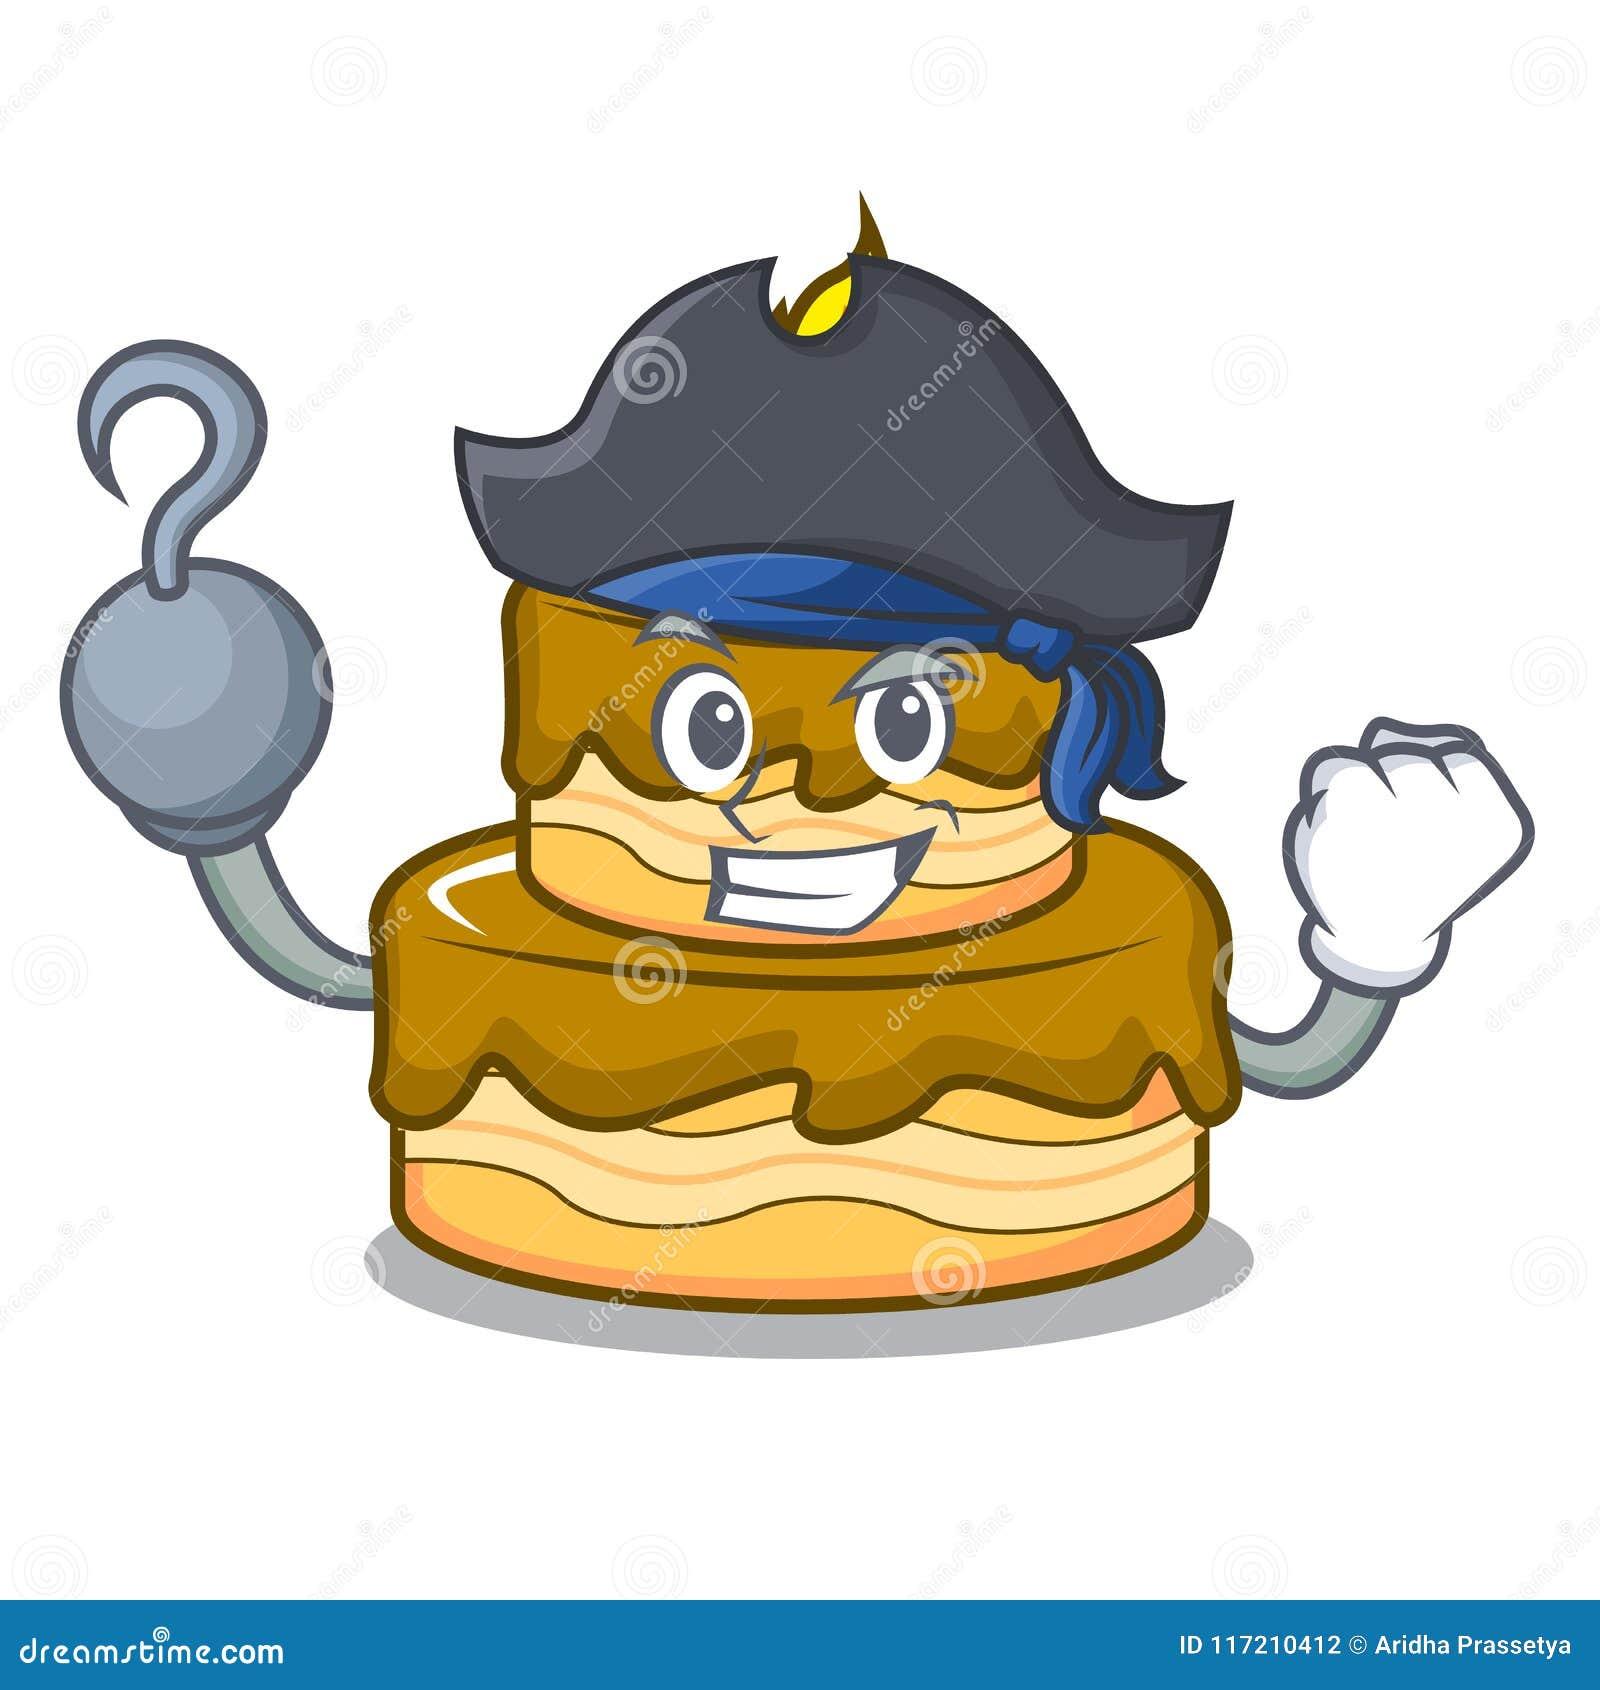 Enjoyable Pirate Birthday Cake Character Cartoon Stock Vector Illustration Birthday Cards Printable Inklcafe Filternl